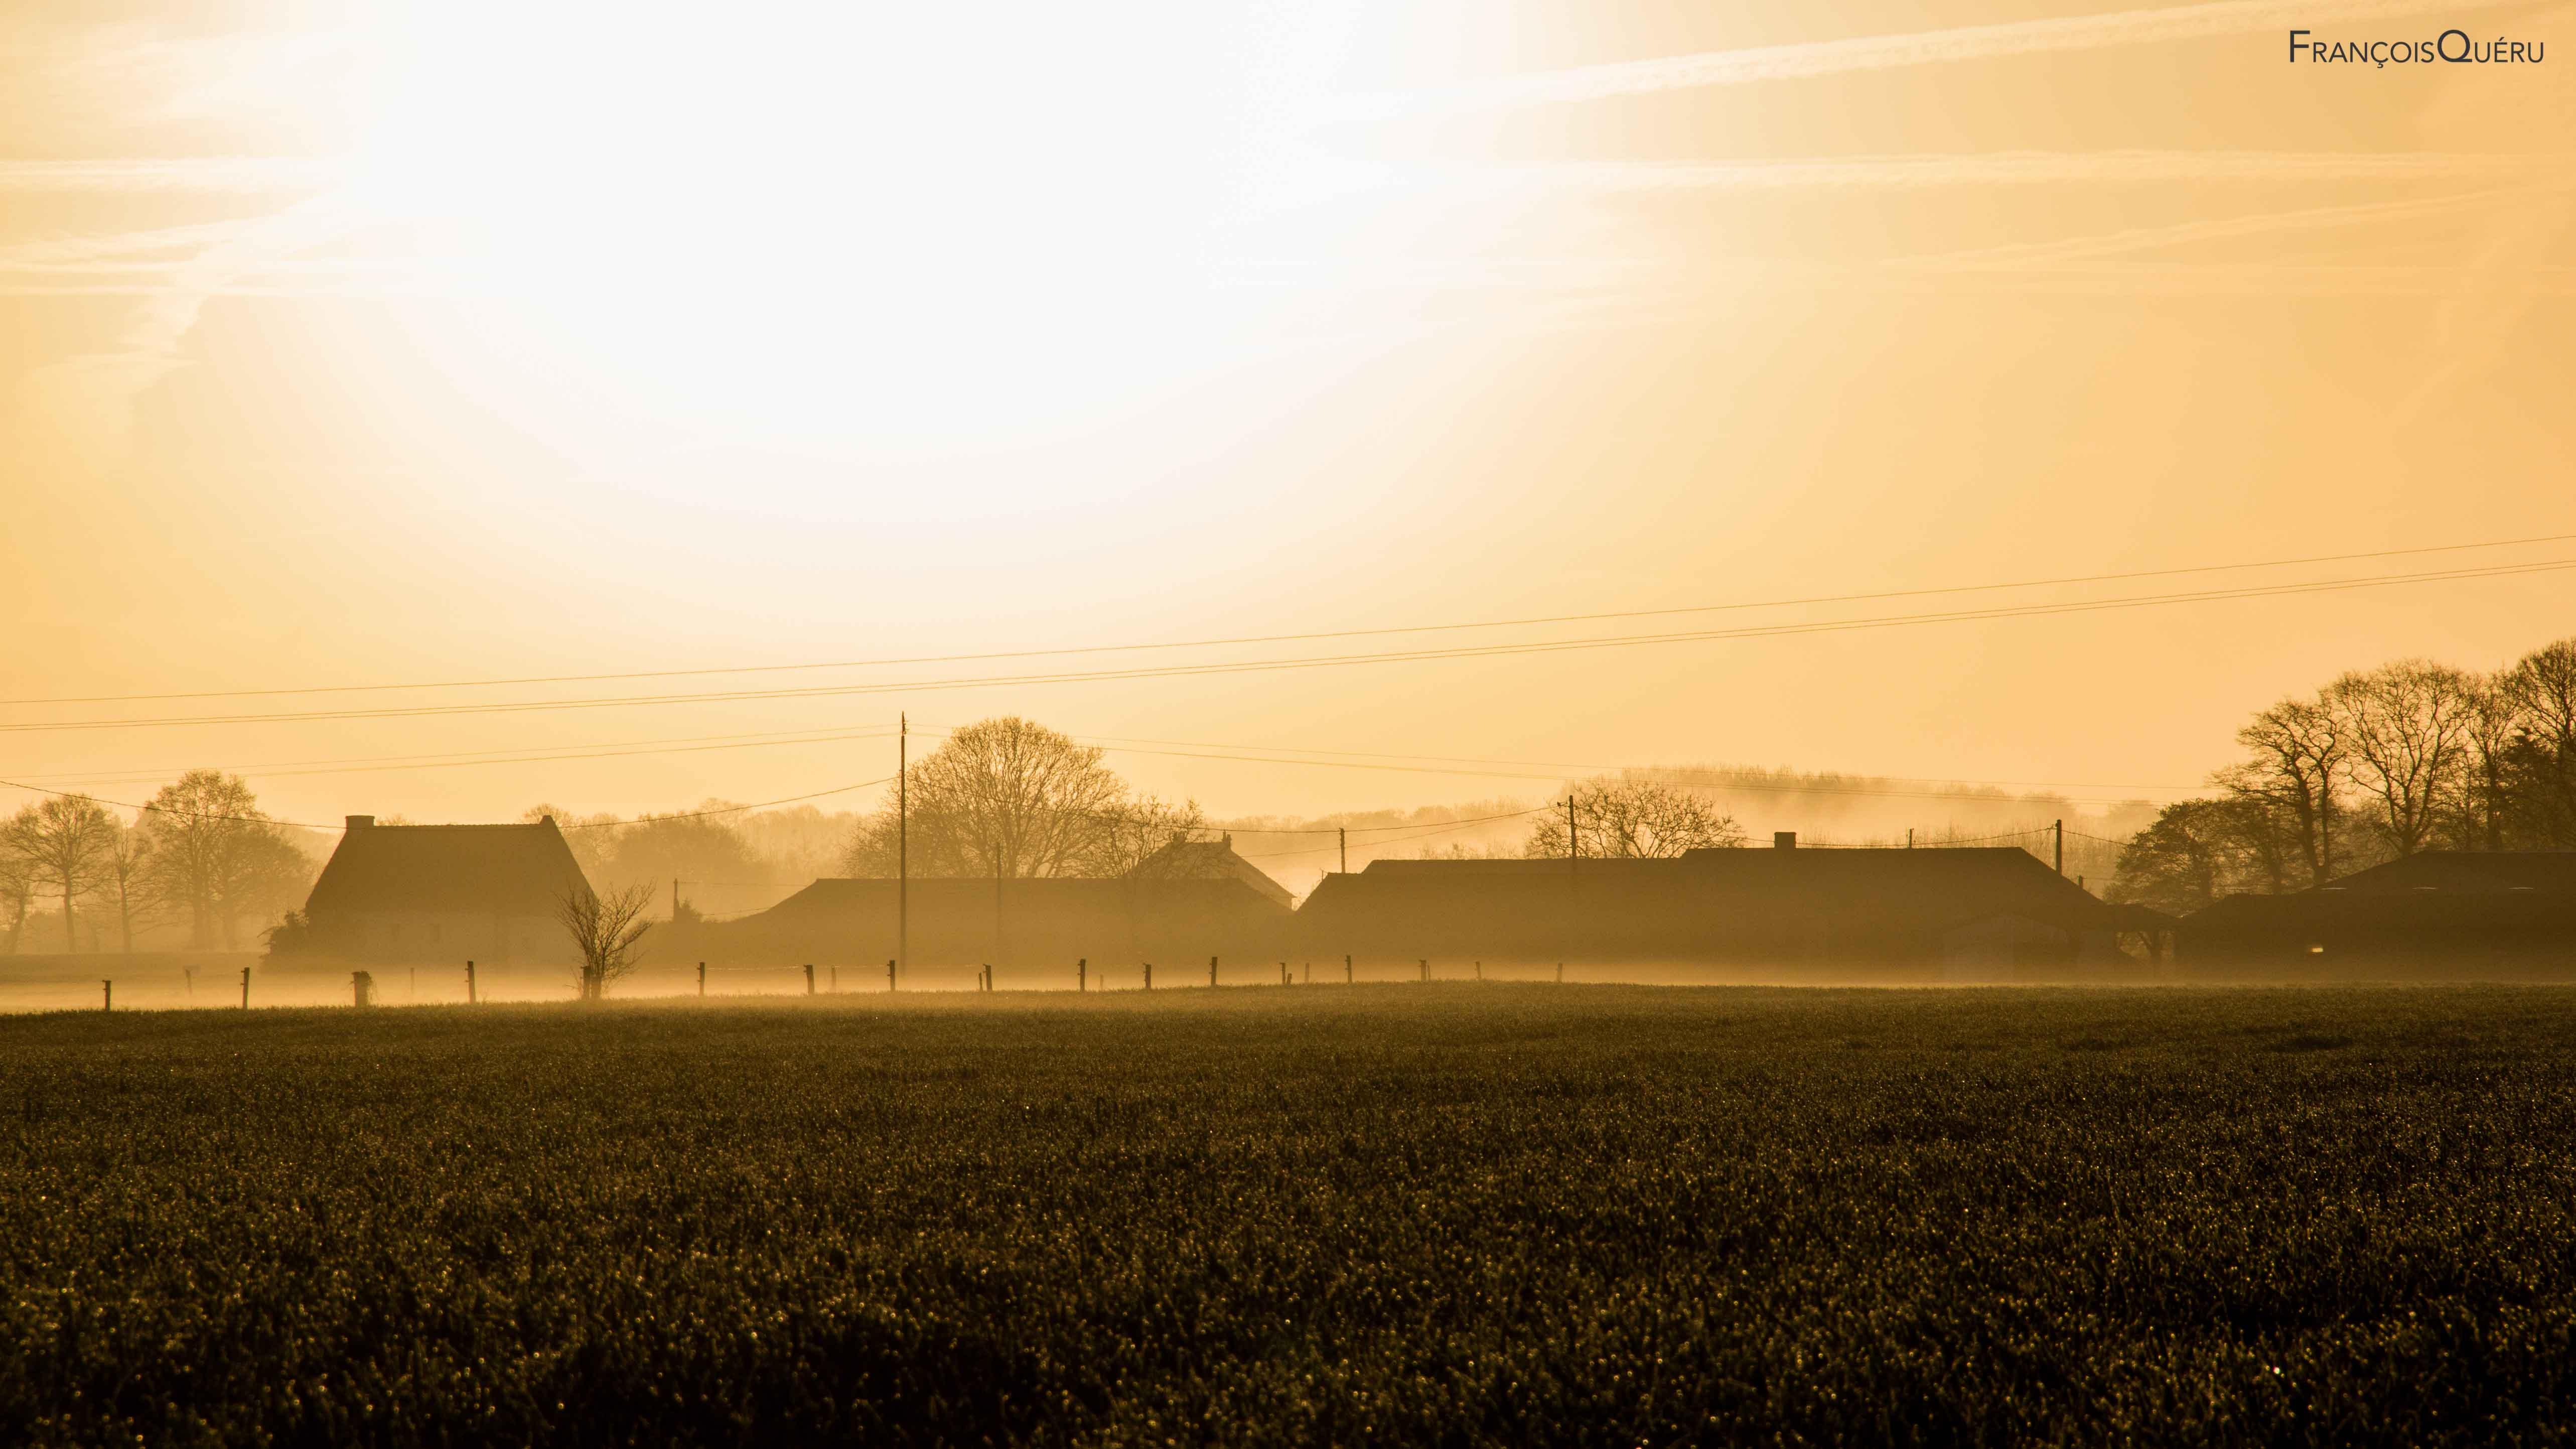 Fond d 39 cran matin lumi re soleil maison brouillard for Paysage francais